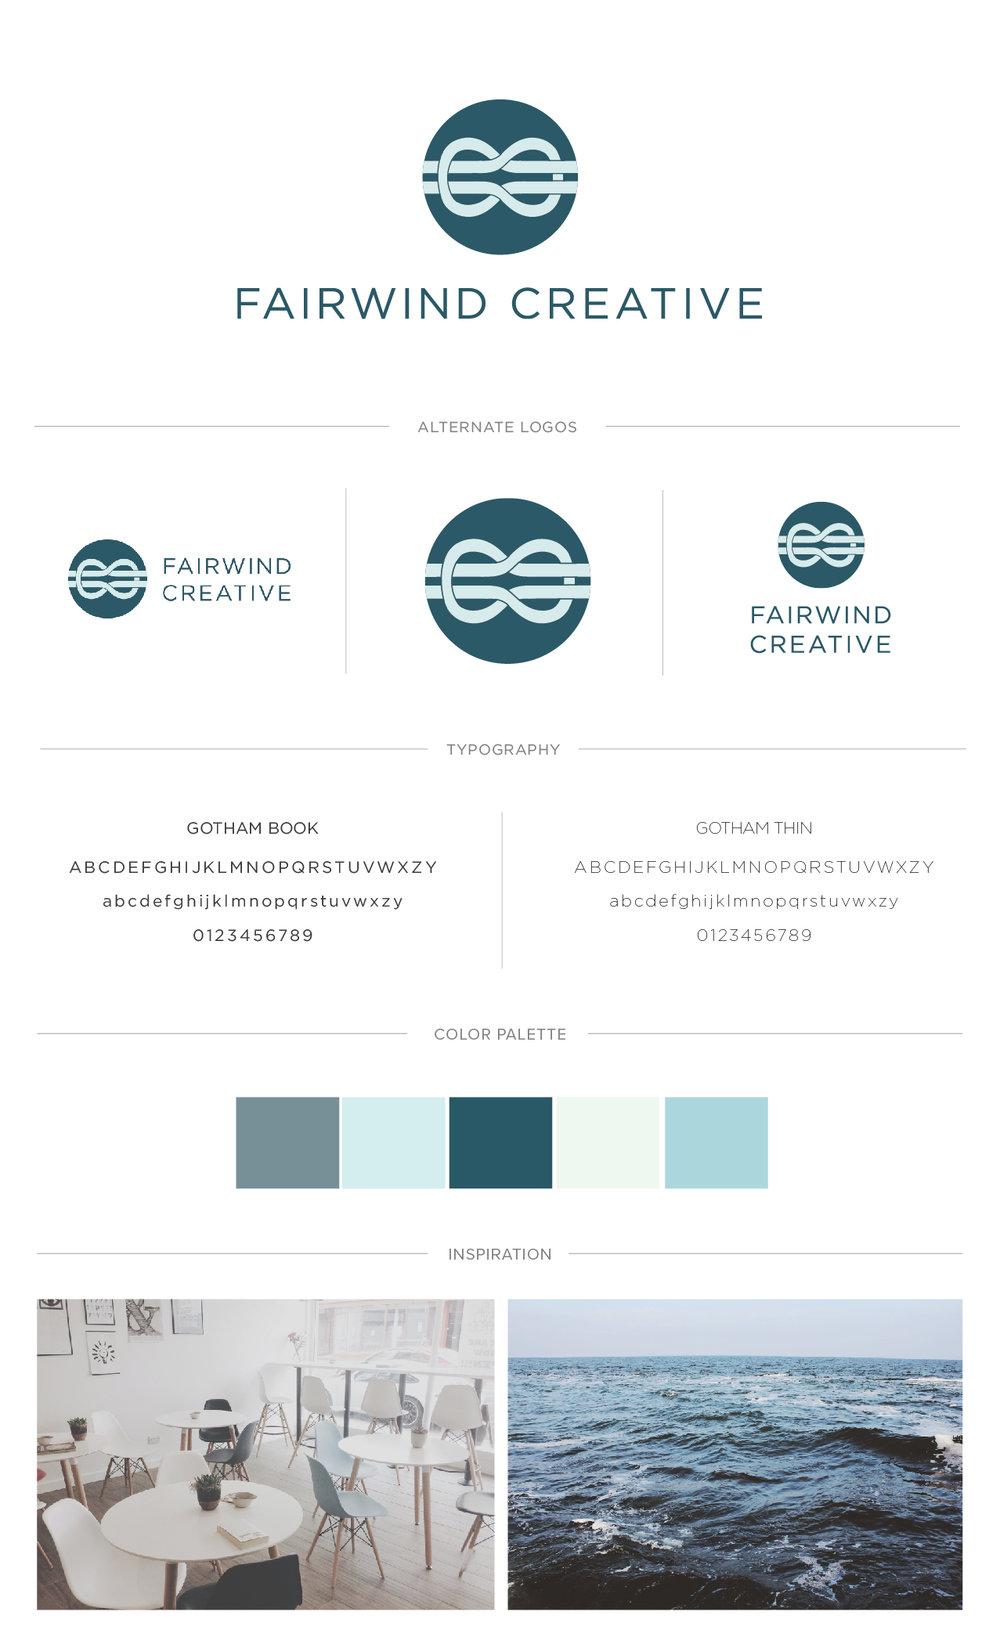 Fairwind Creative Brand Board | Coaching for Creative Entrepreneurs